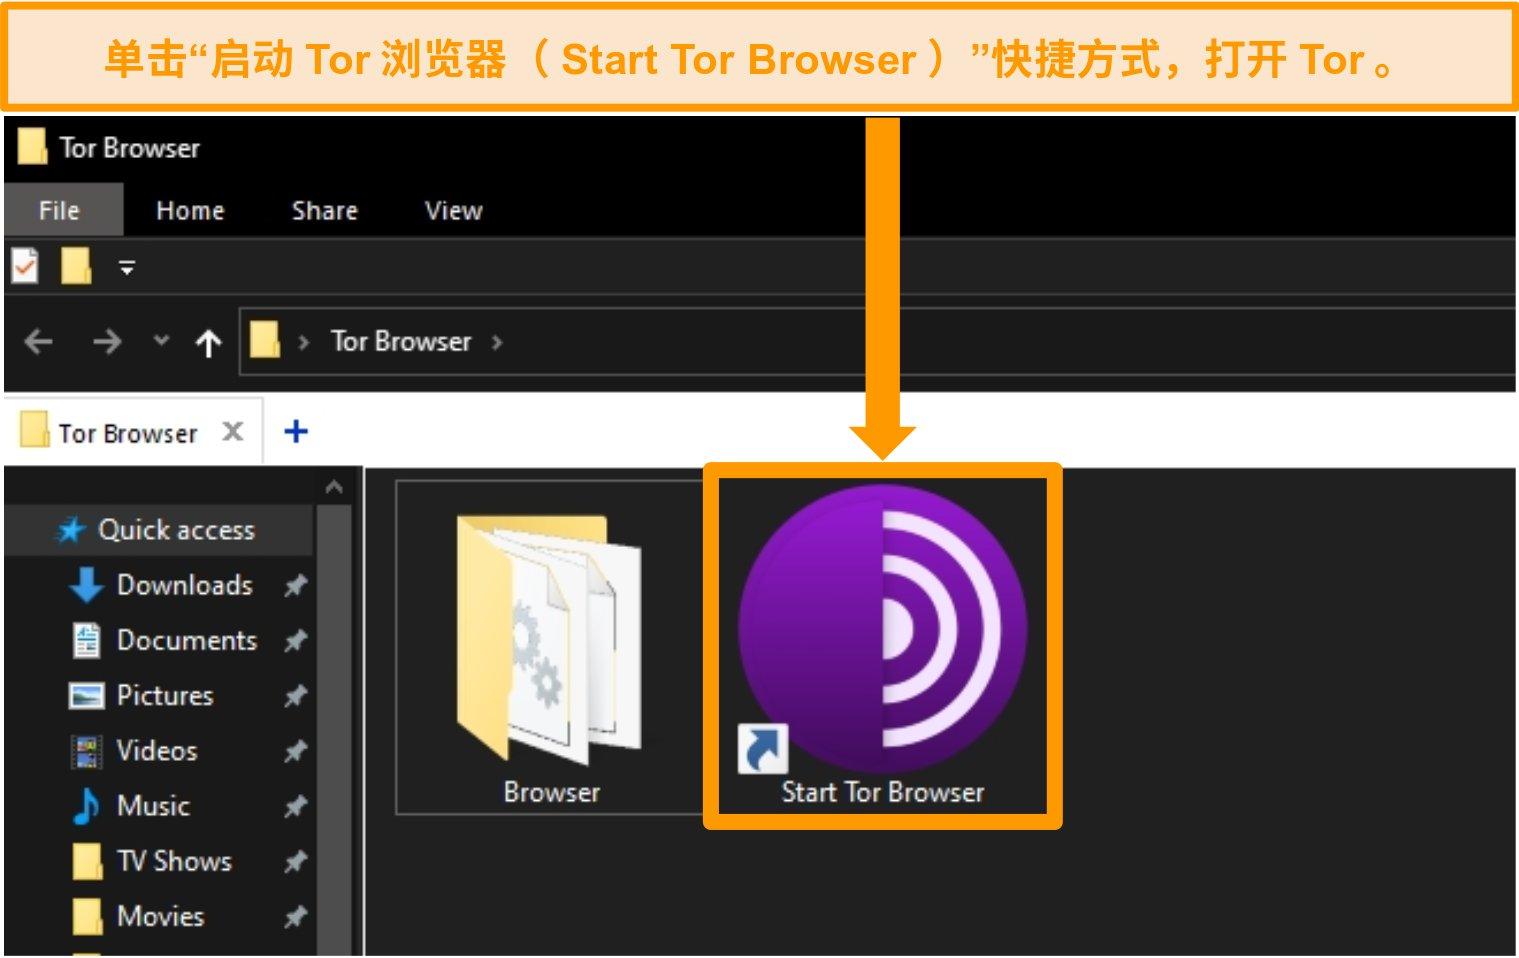 Windows上Tor浏览器安装快捷方式的屏幕截图